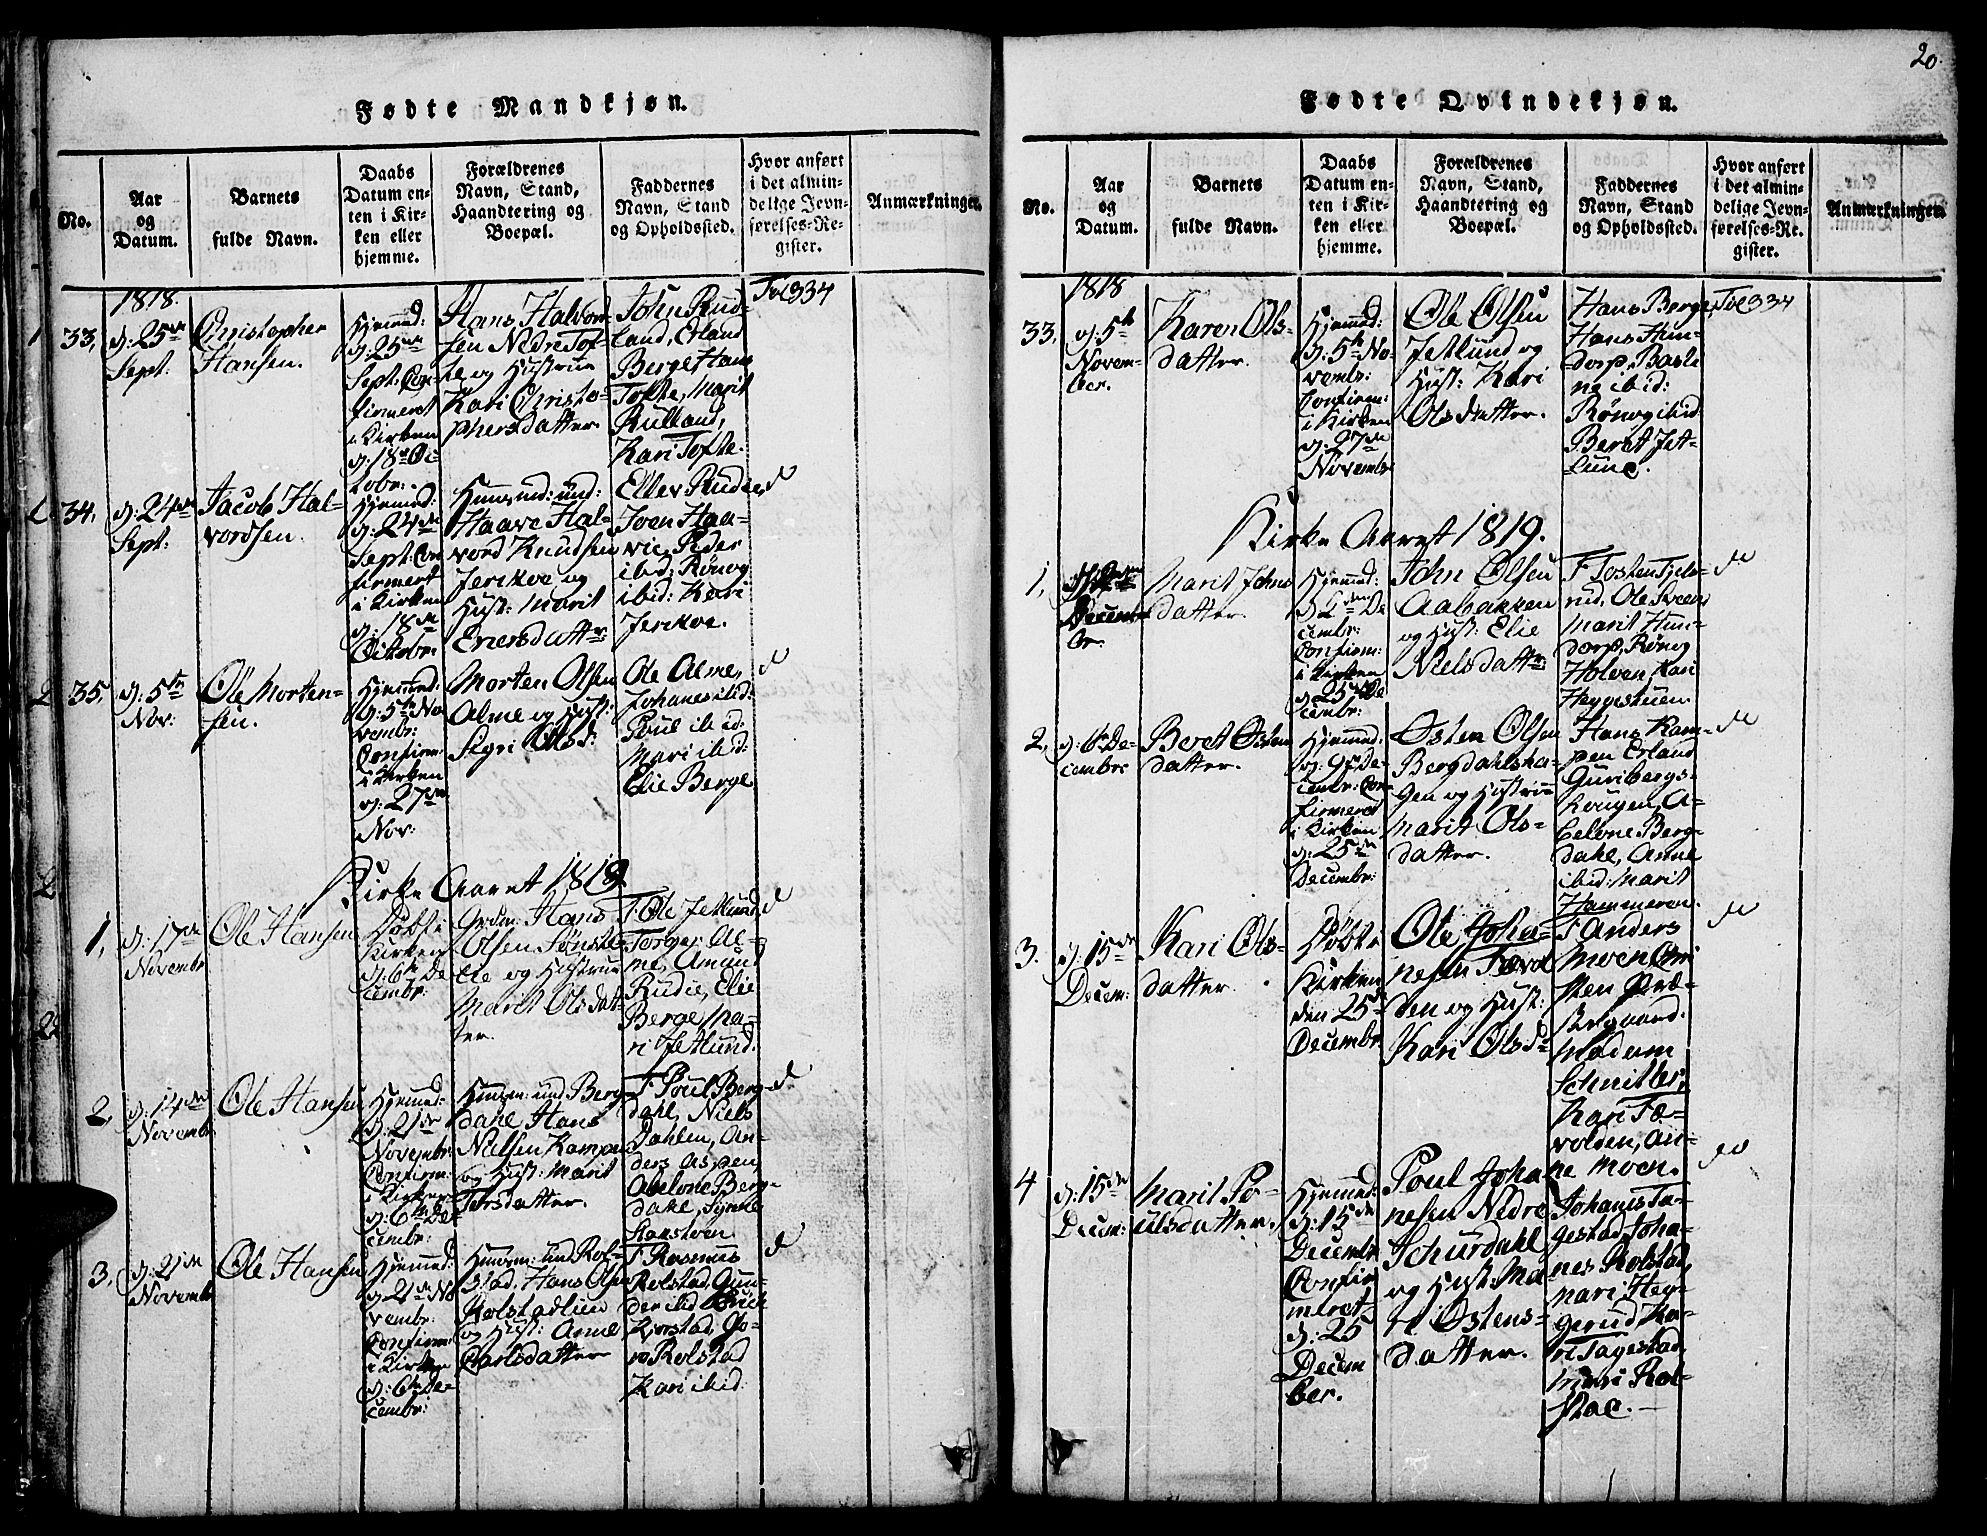 SAH, Fron prestekontor, H/Ha/Hab/L0001: Klokkerbok nr. 1, 1816-1843, s. 20